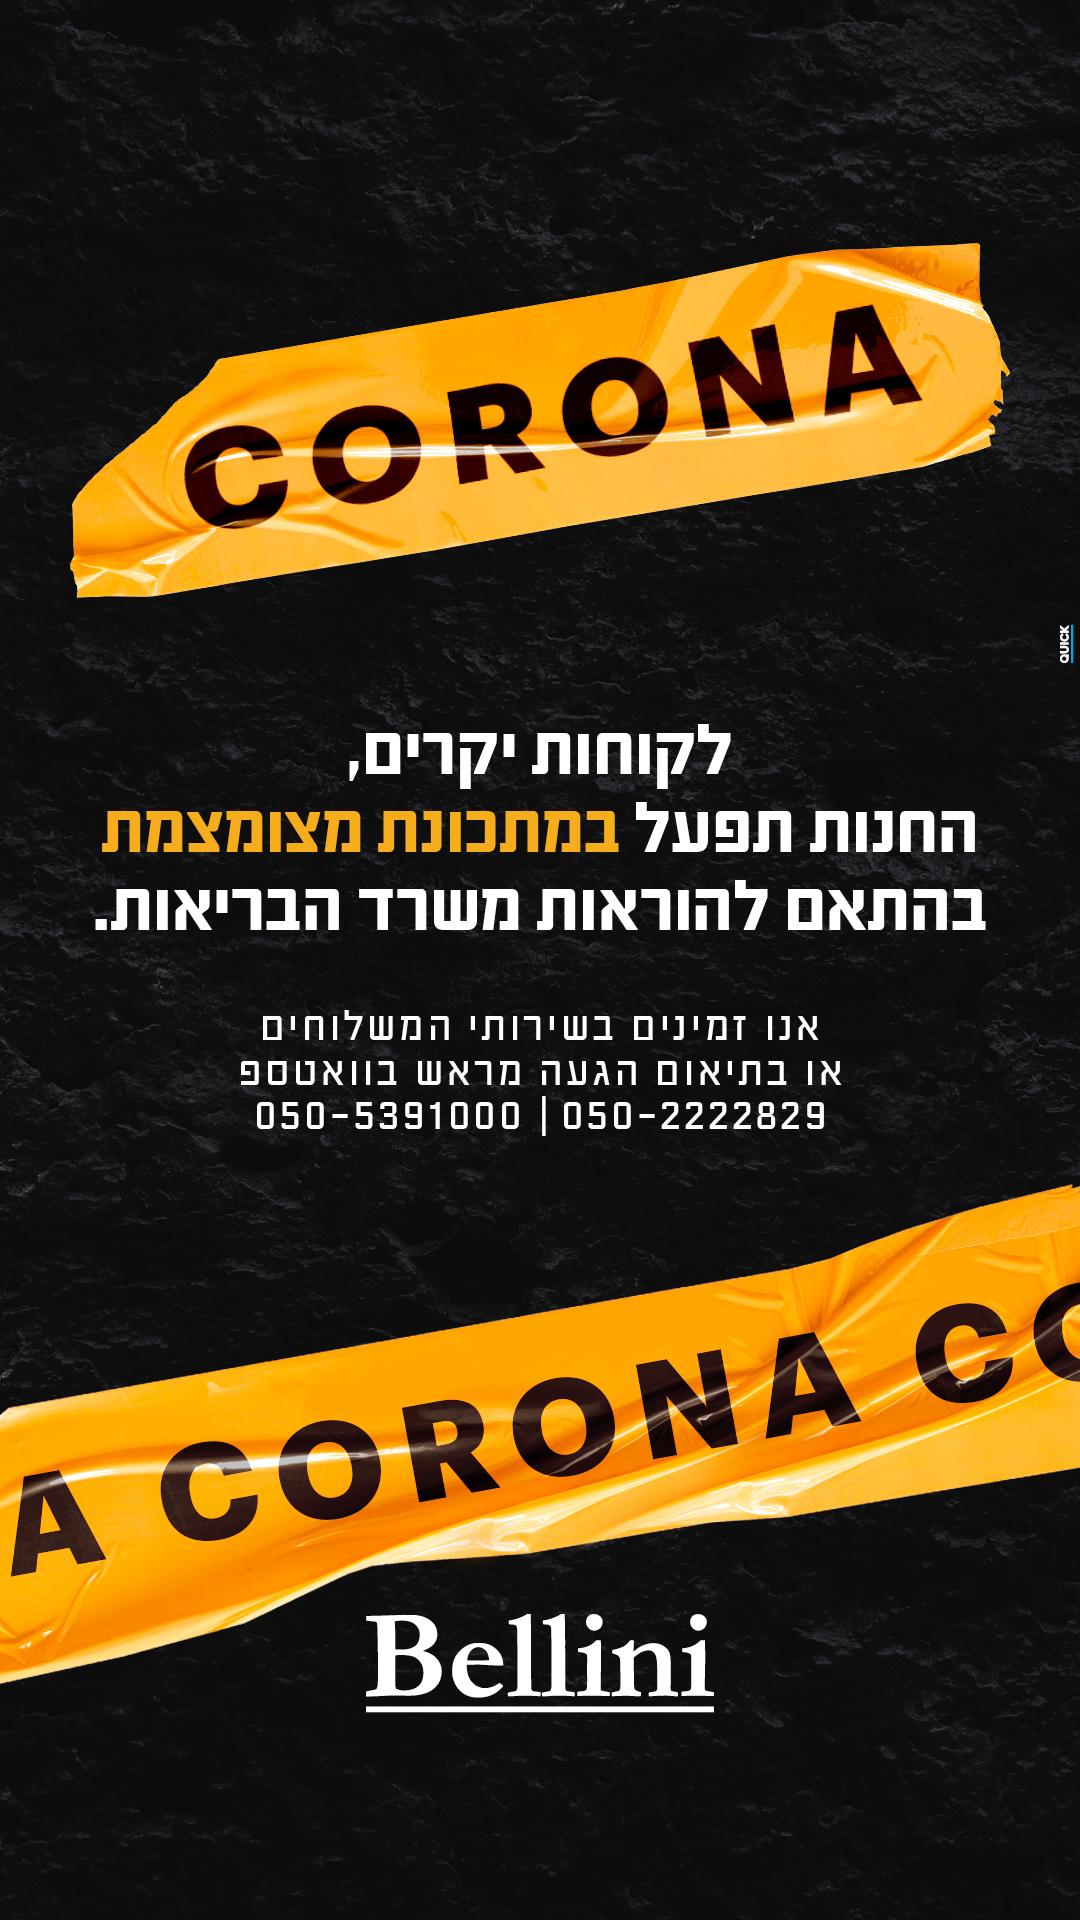 498174643-Bellini_Closed_Corona-a4